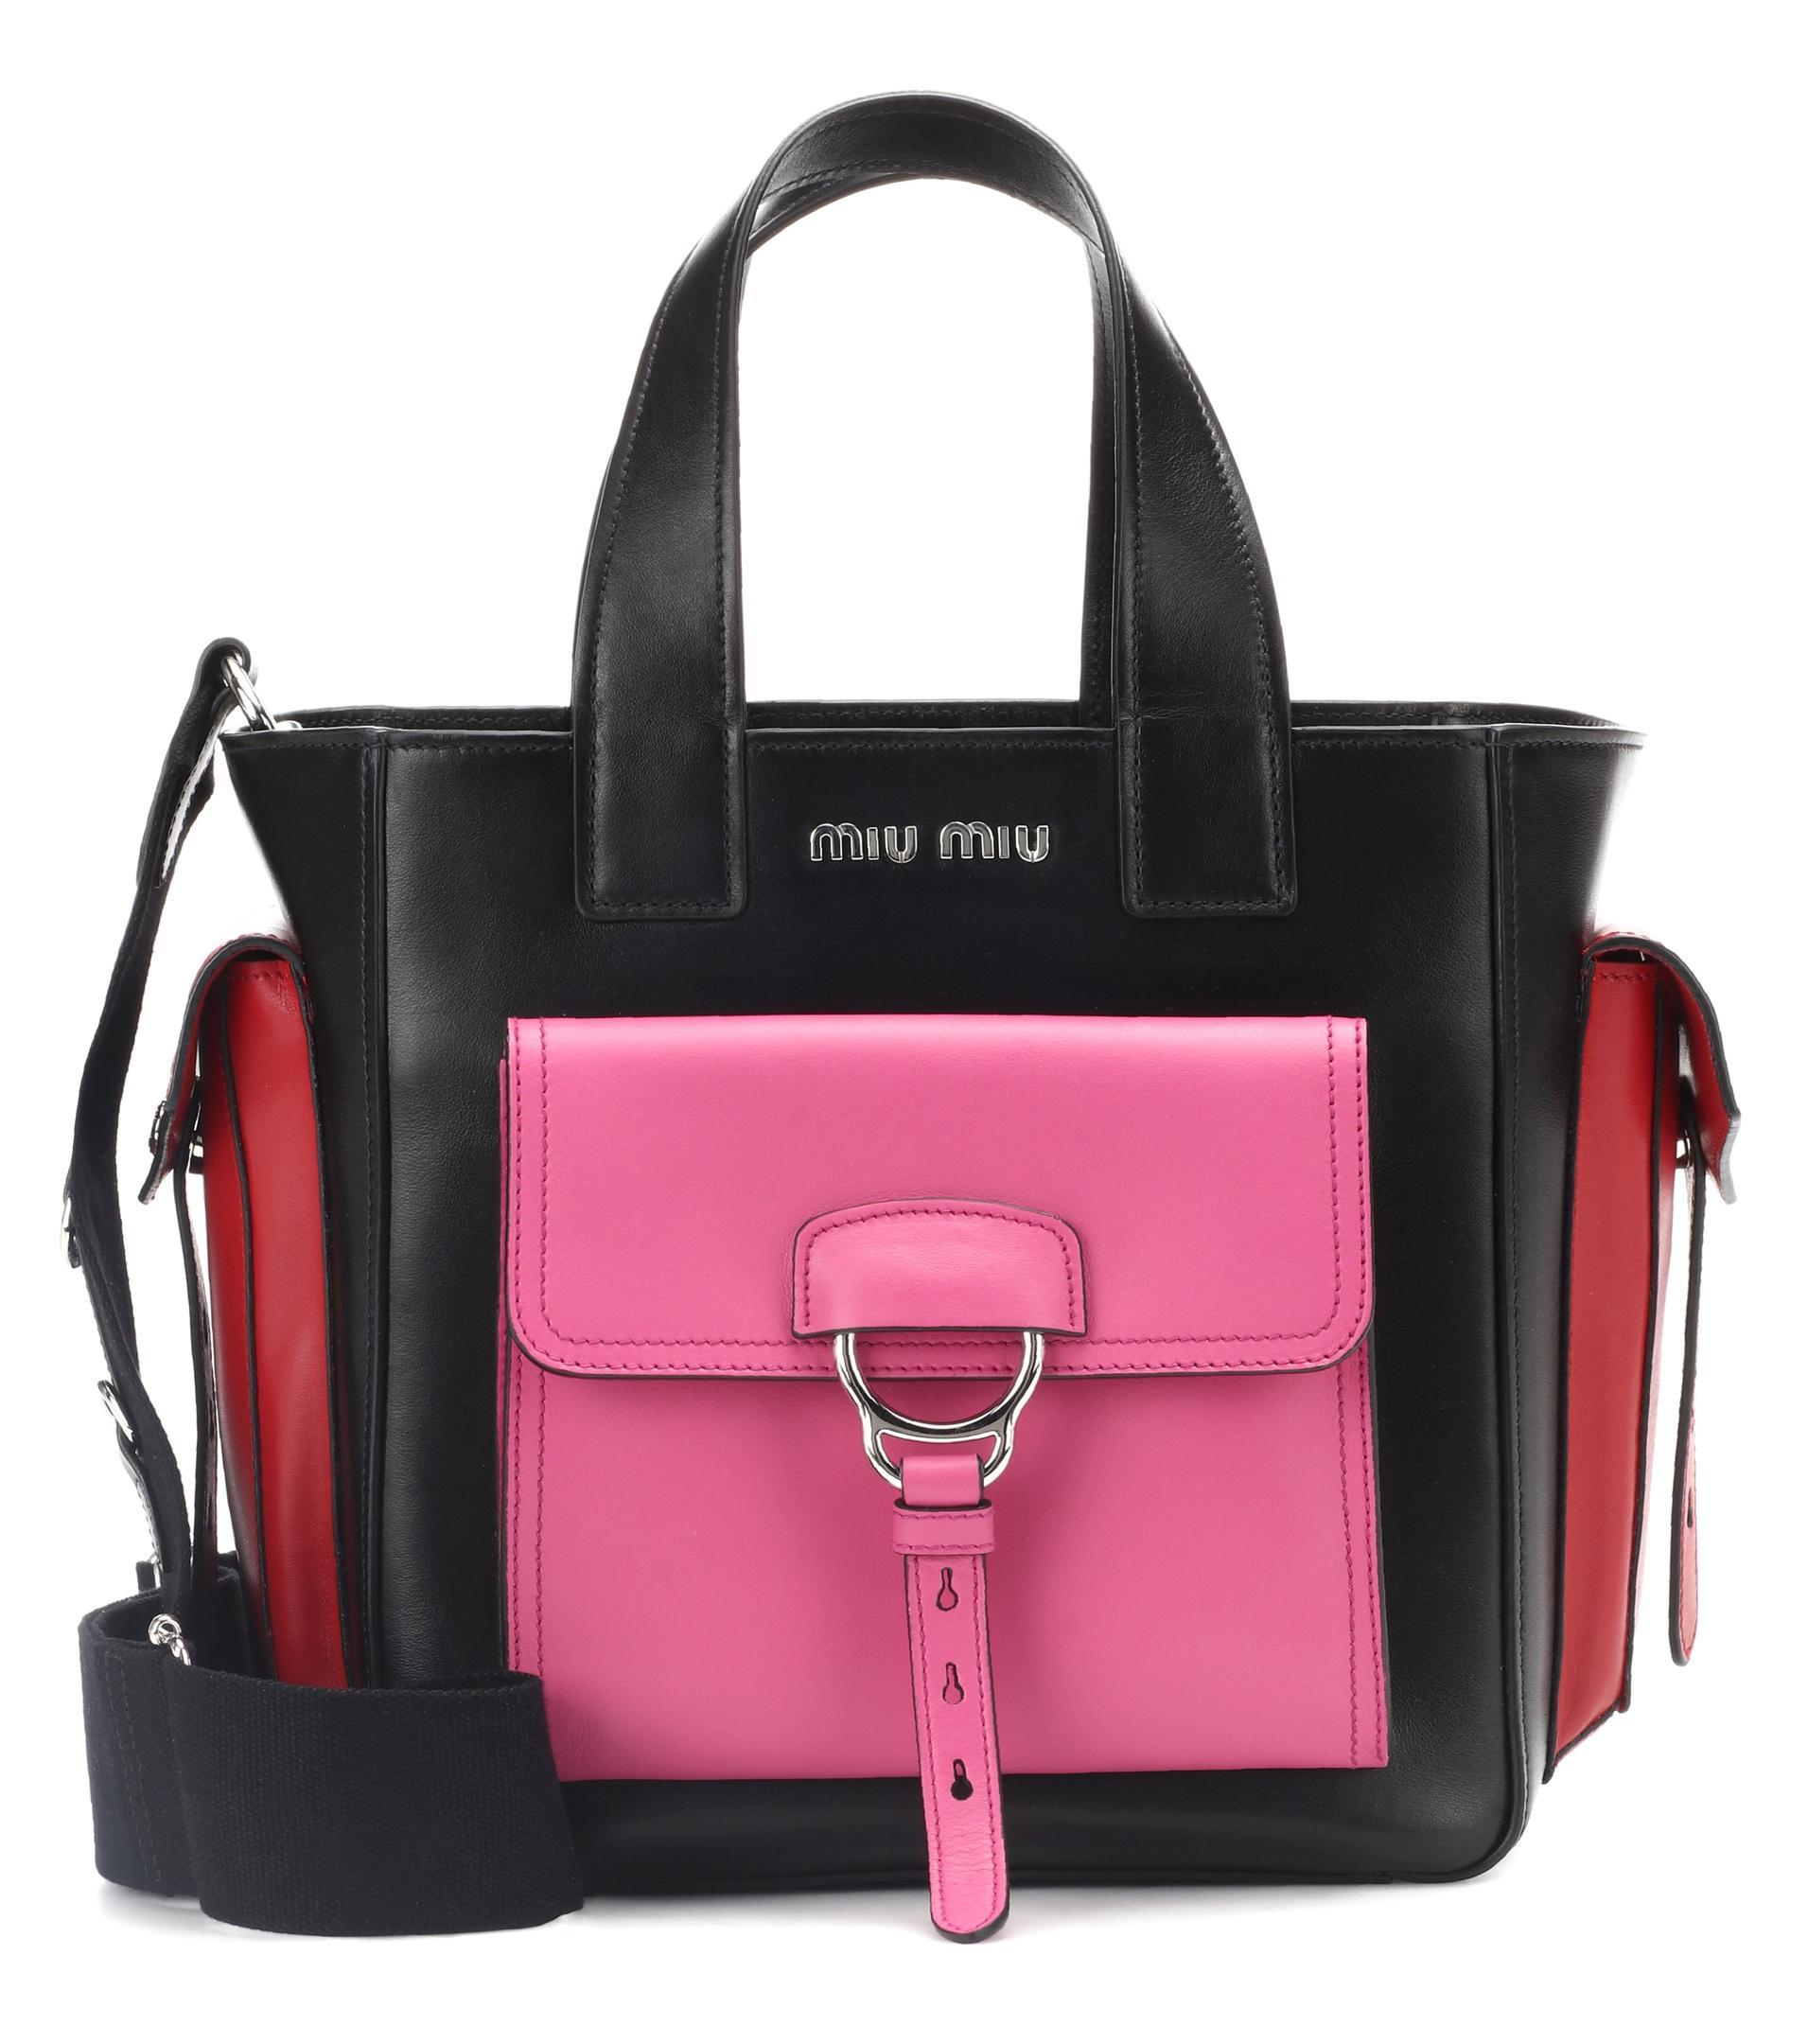 5f2b30104472 Lyst - Miu Miu Leather Shoulder Bag in Black